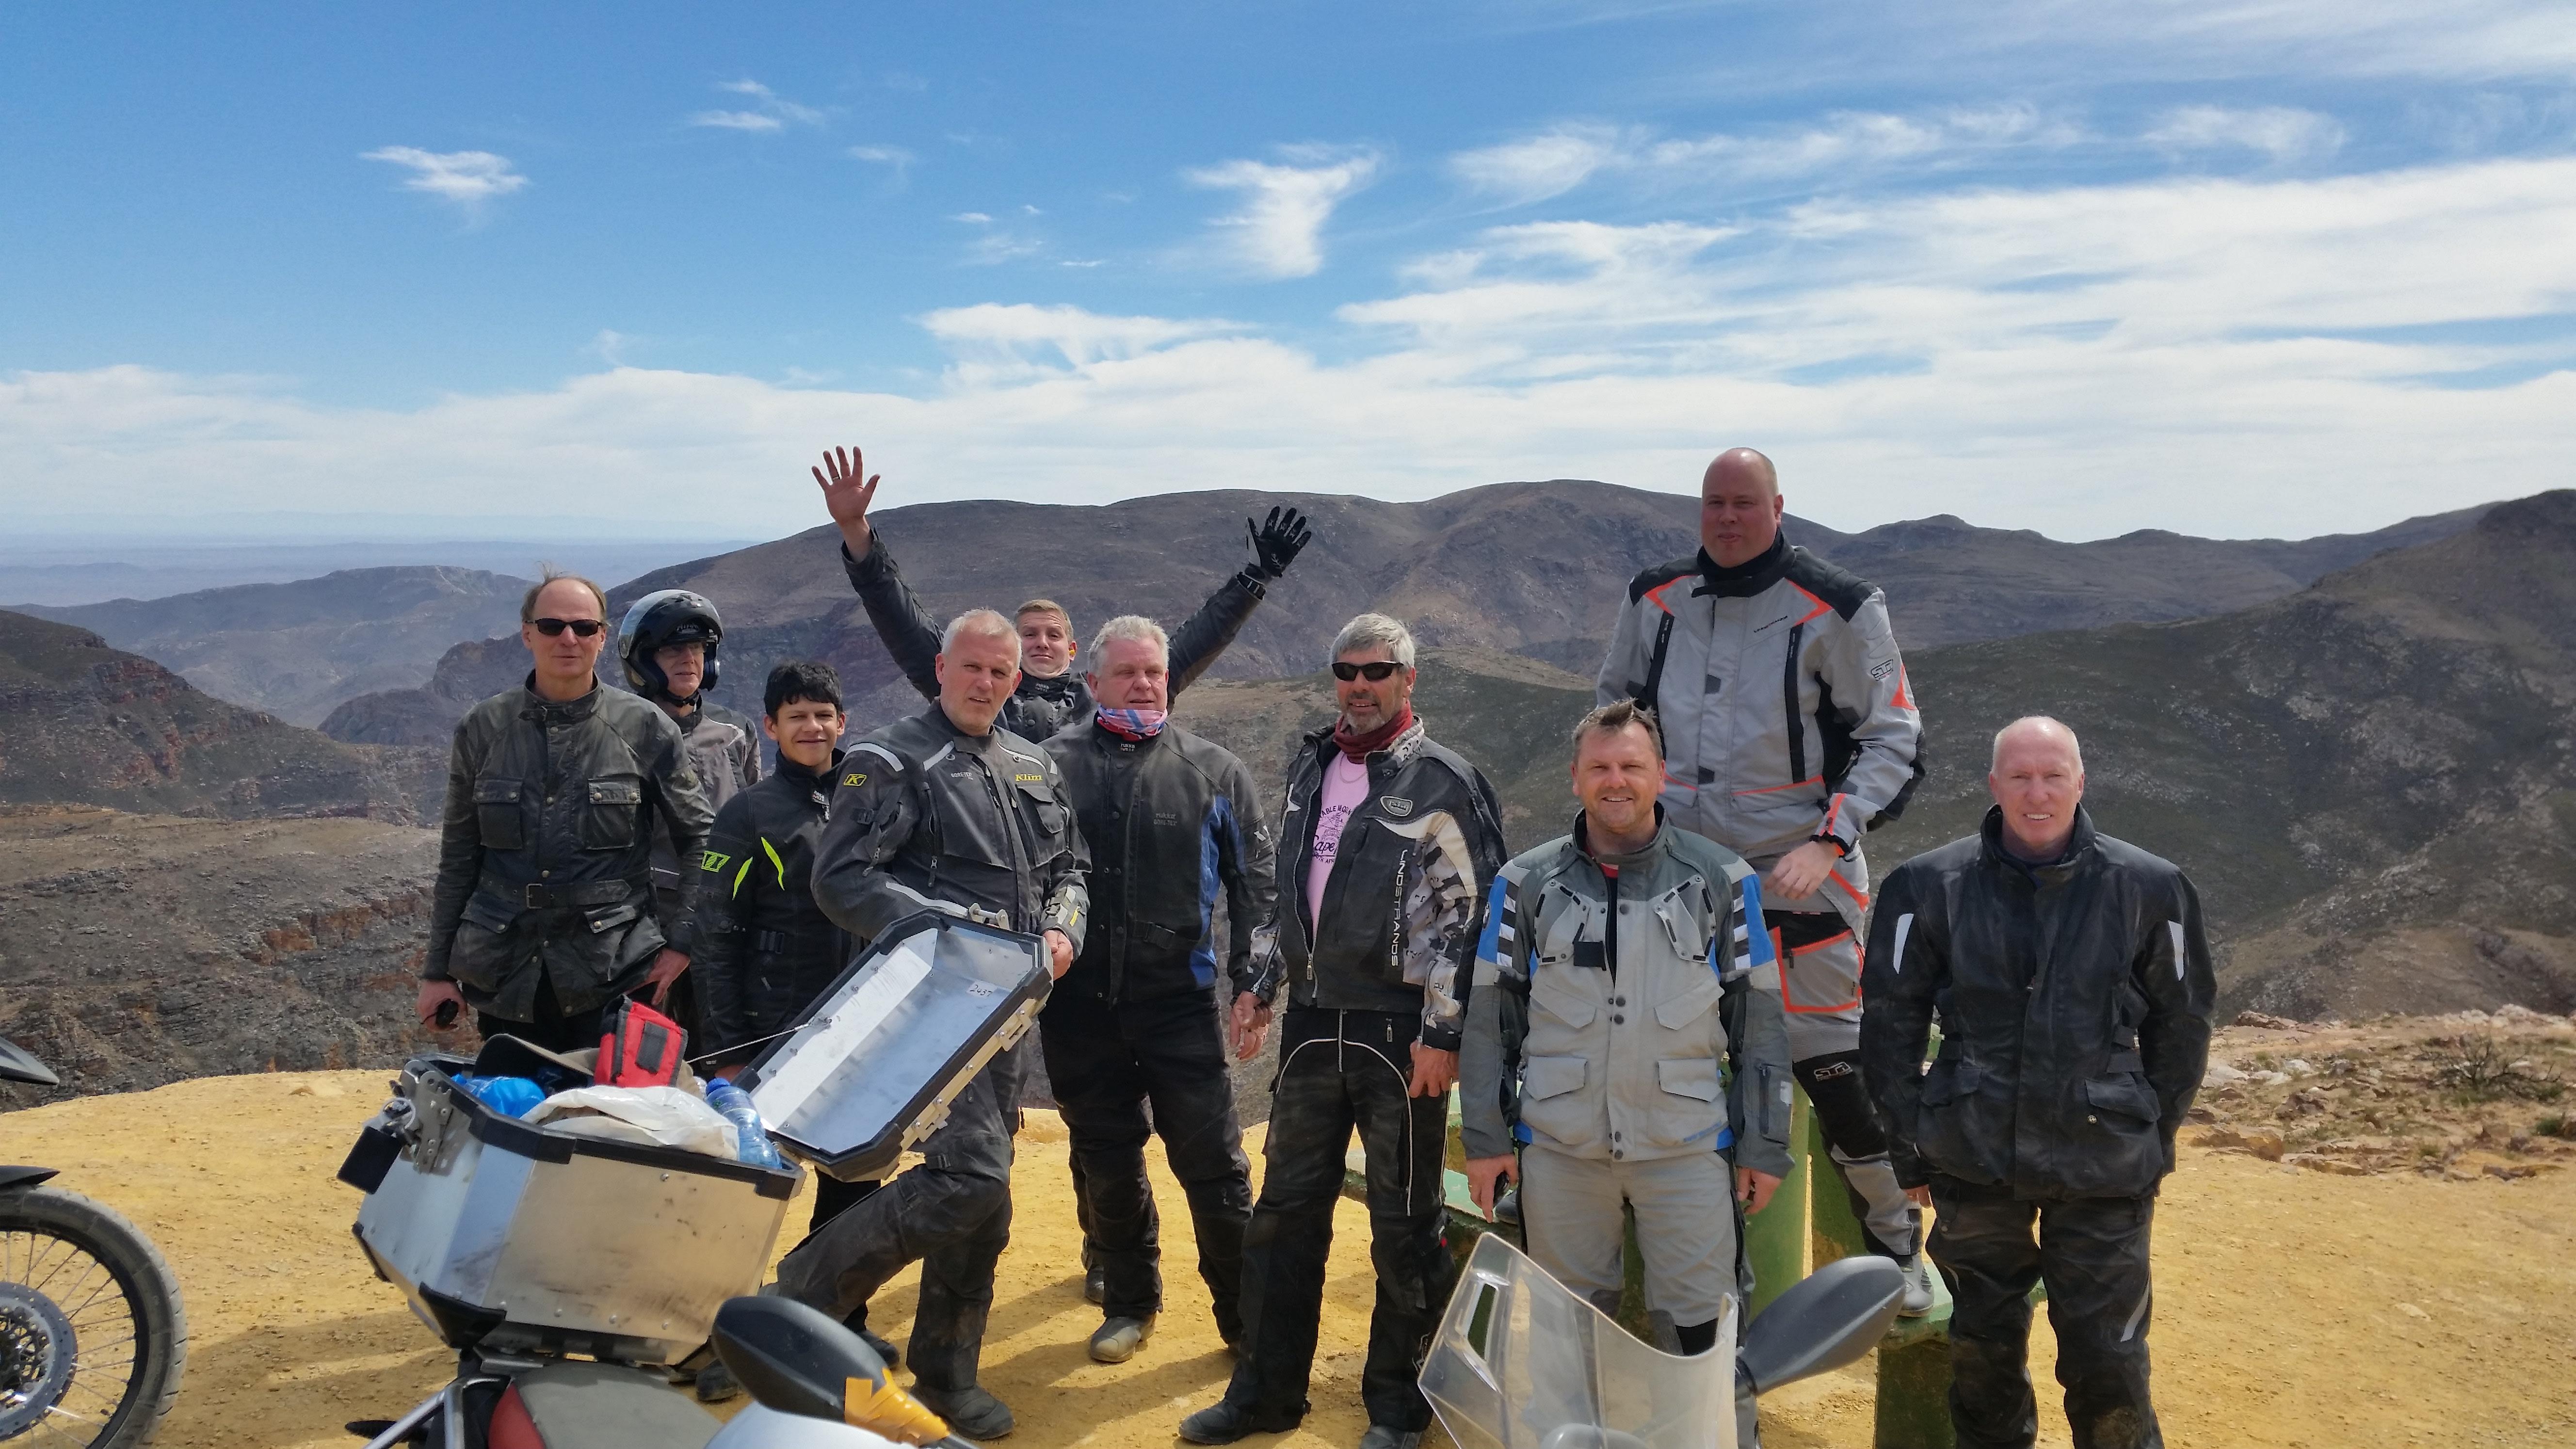 Motorbike Adventures in South Africa